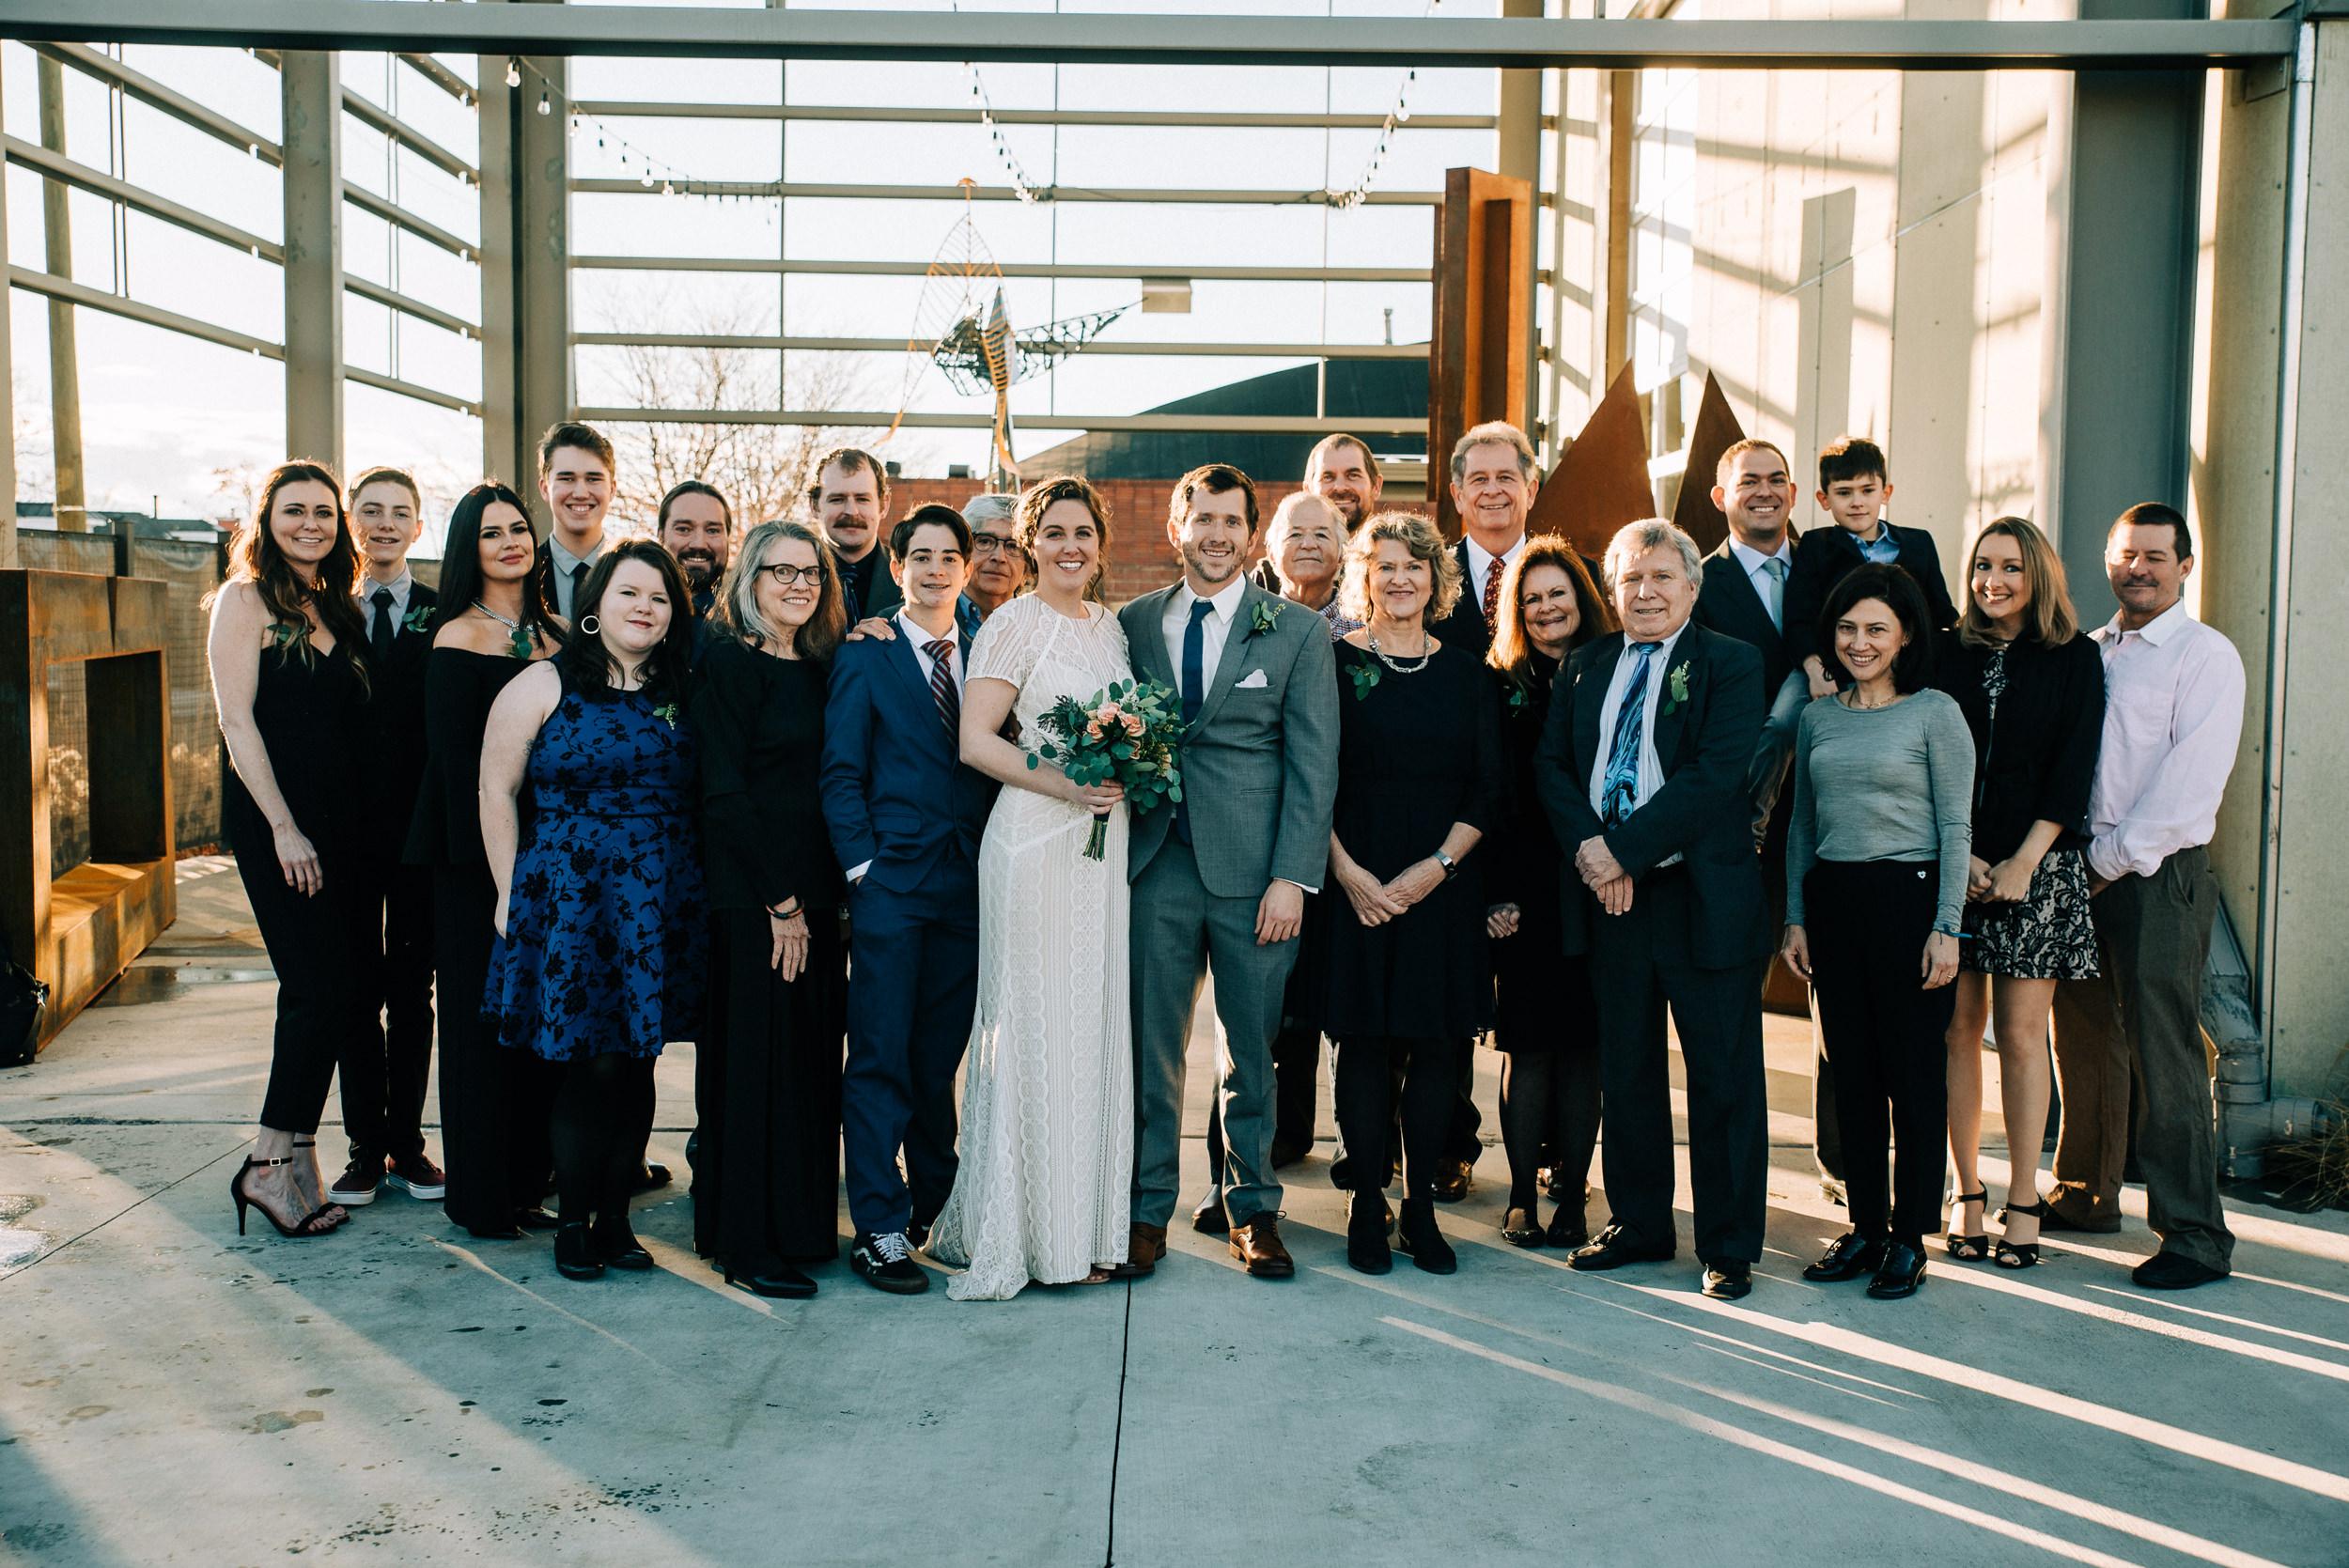 Wedding Family portraits at the Space Gallery sculpture garden-Denver Wedding Photographer-Colorado Kate Photography